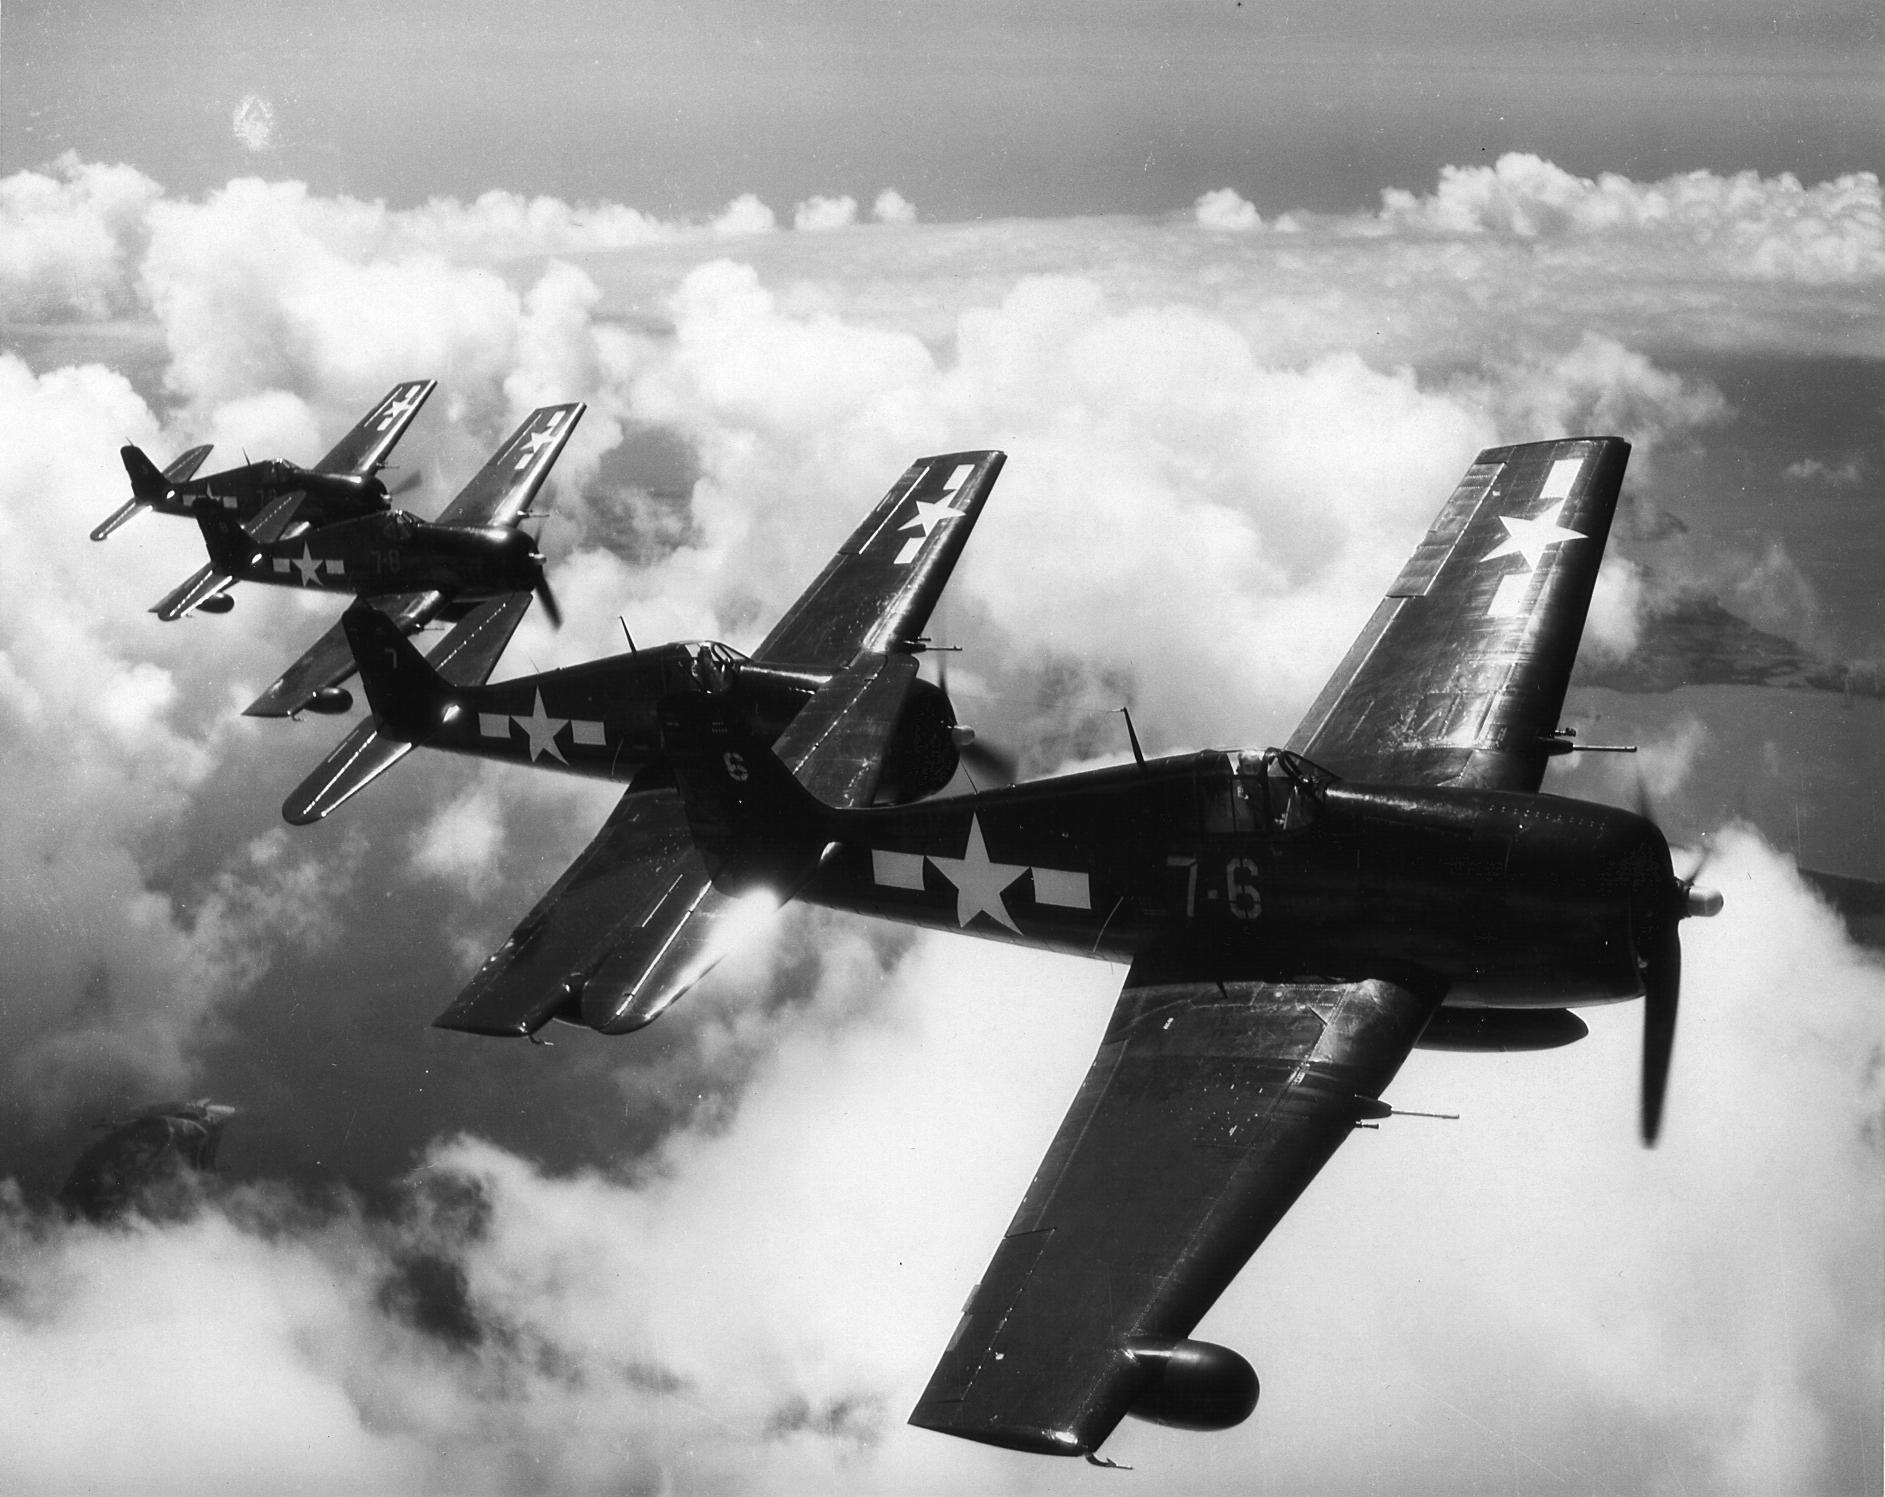 Grumman F6F 5N Hellcat VFN 107 White 76 from NAS Quonset Point RI 01